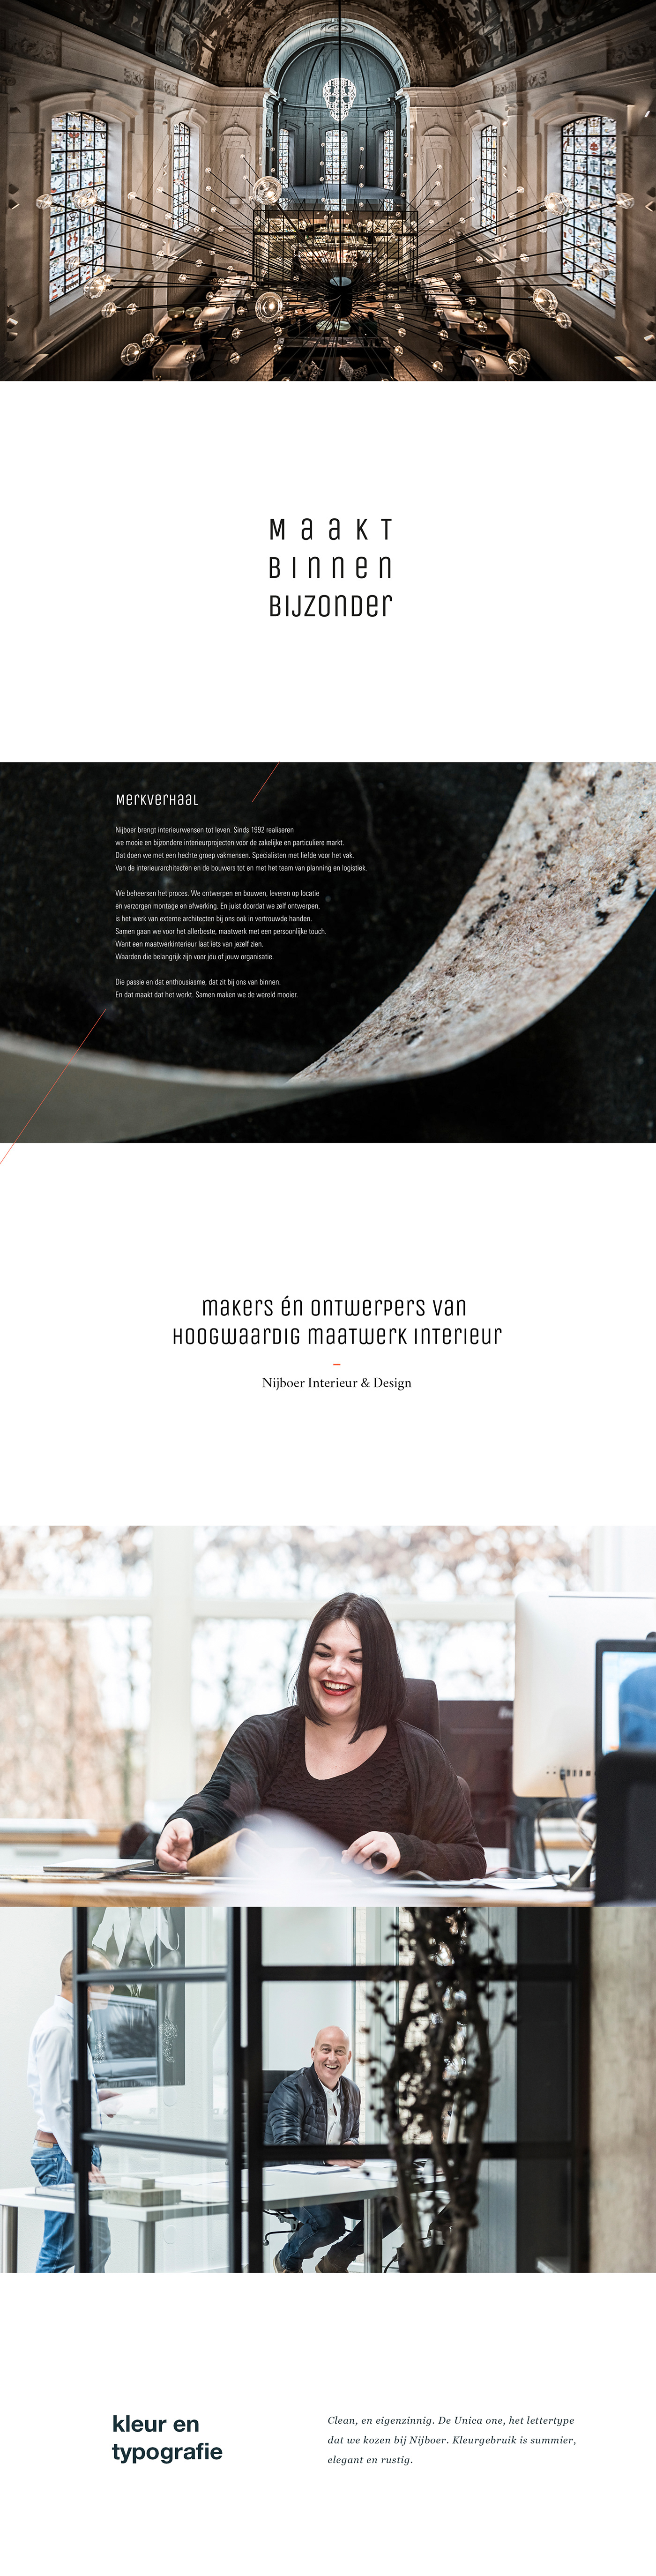 branding  identity uxdesign uidesign Webdesign Photography  development interior design  mission vision